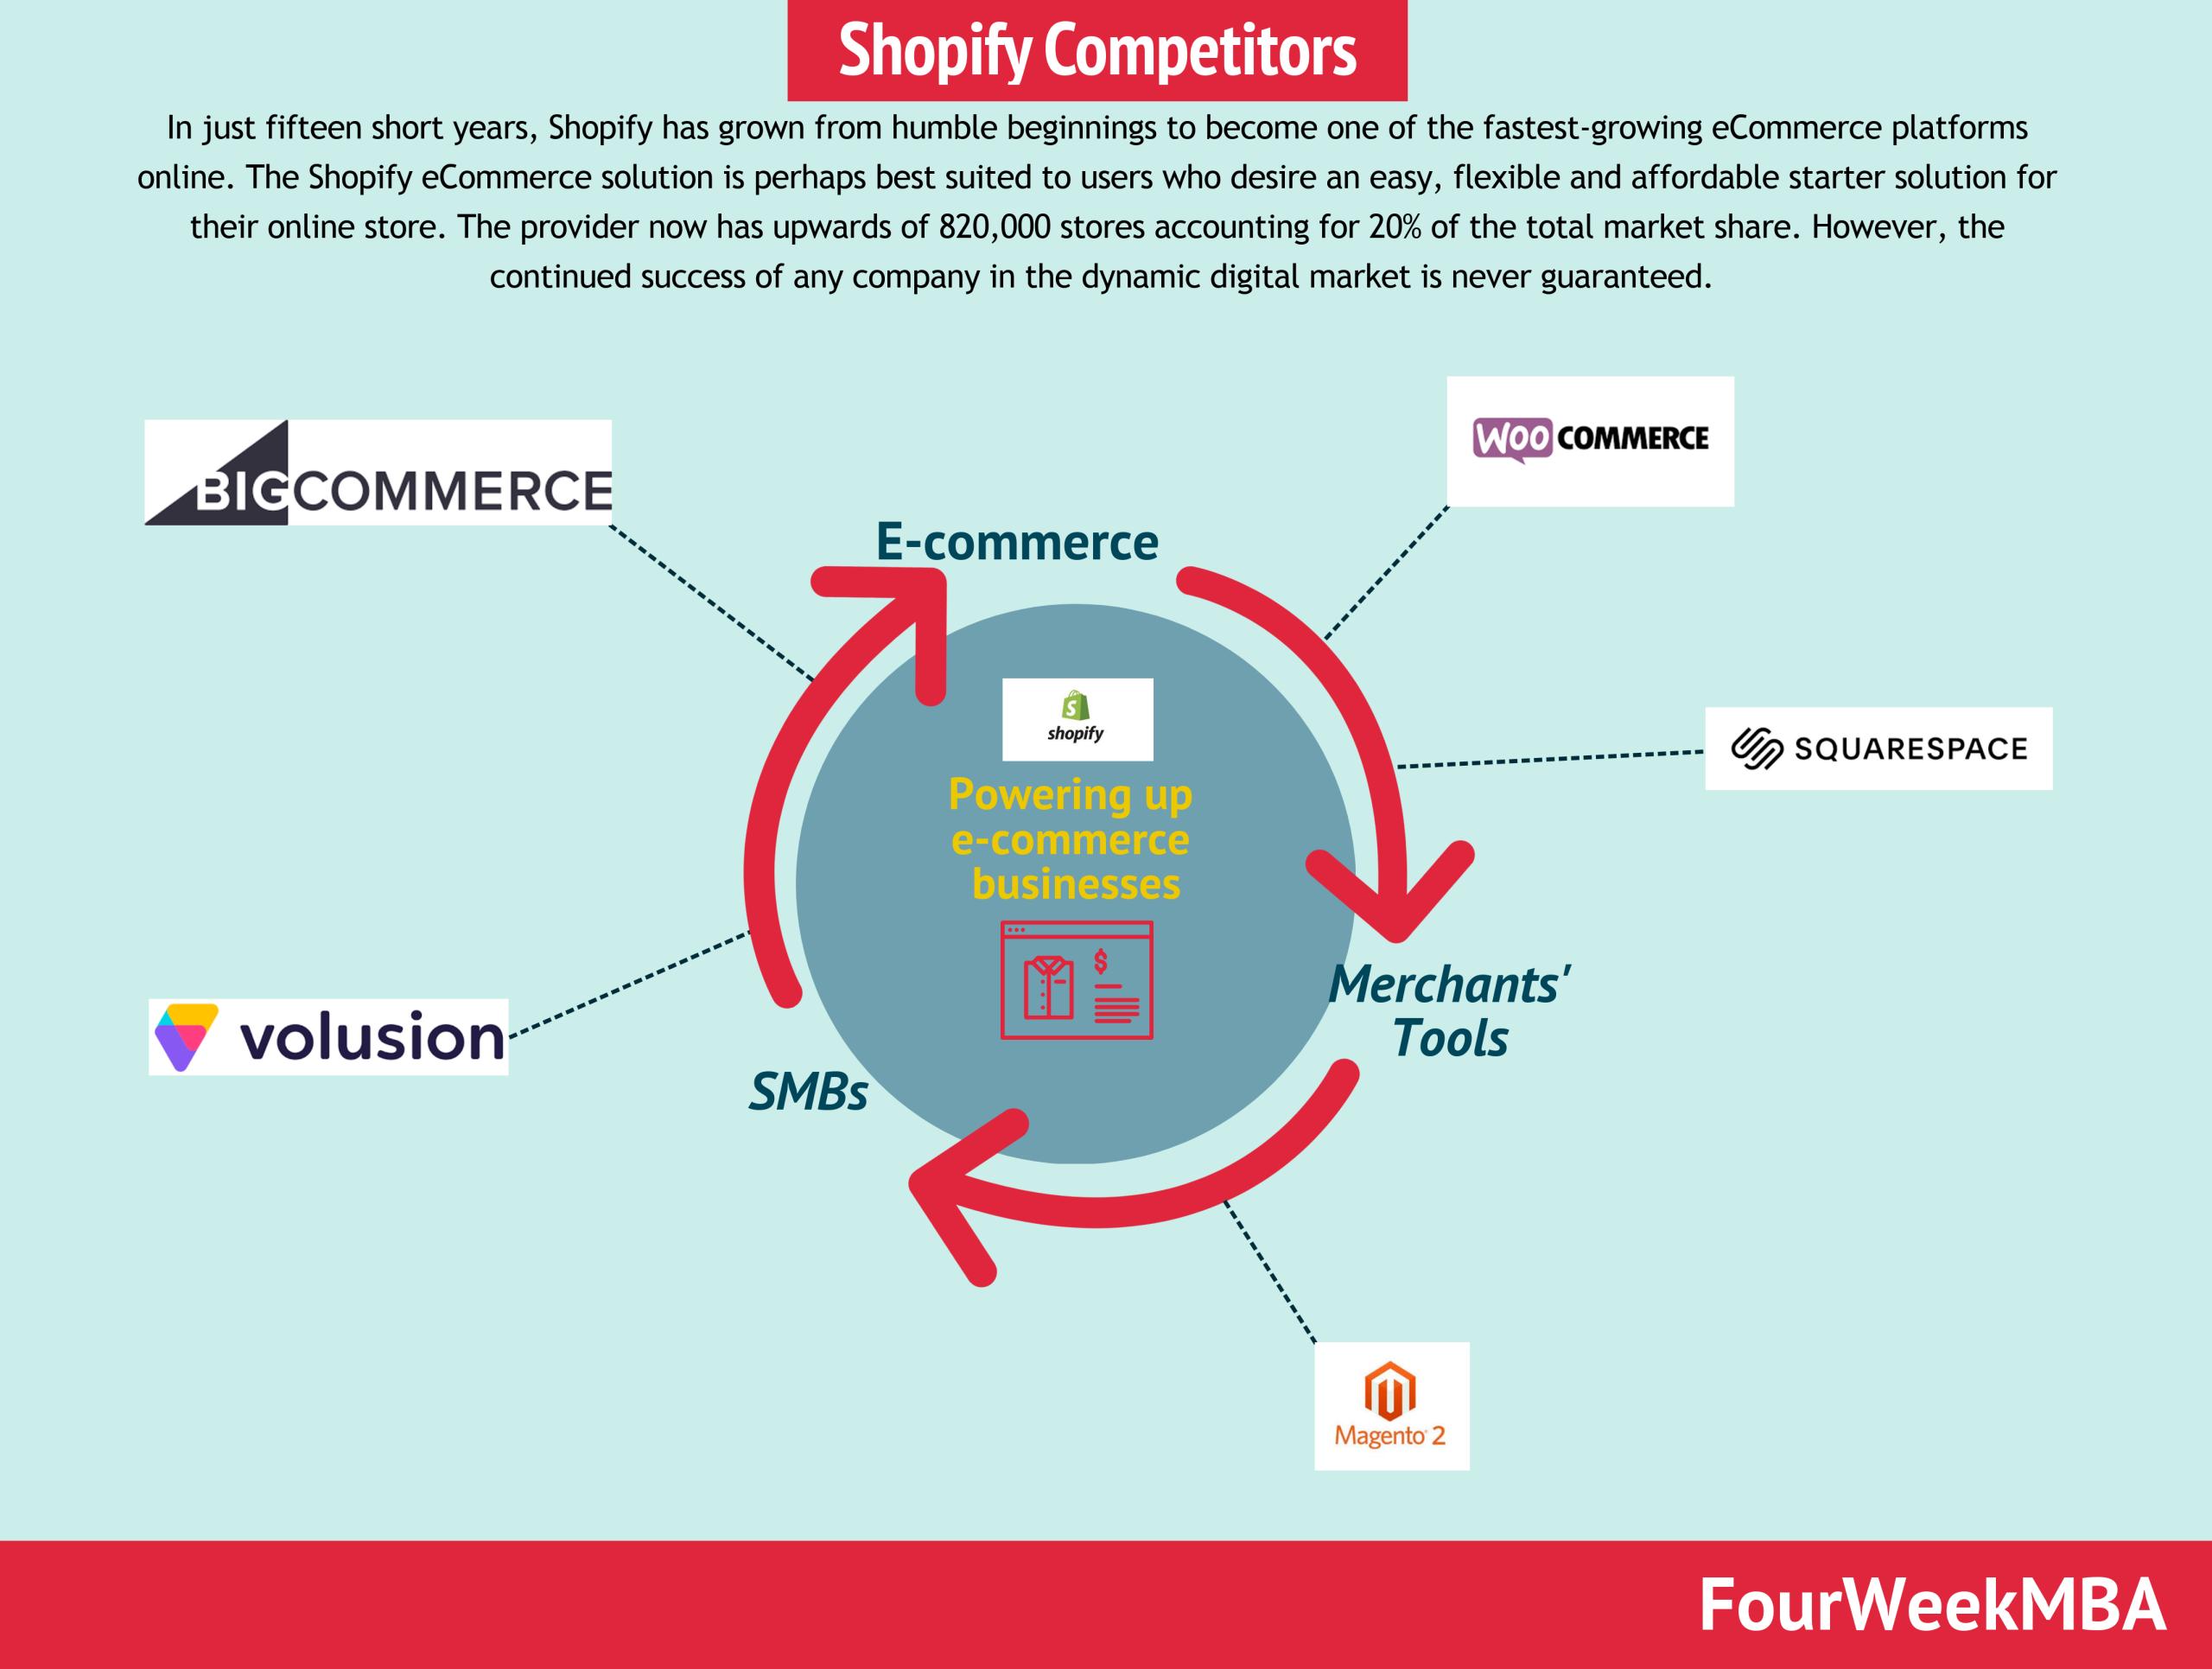 shopify-competitors